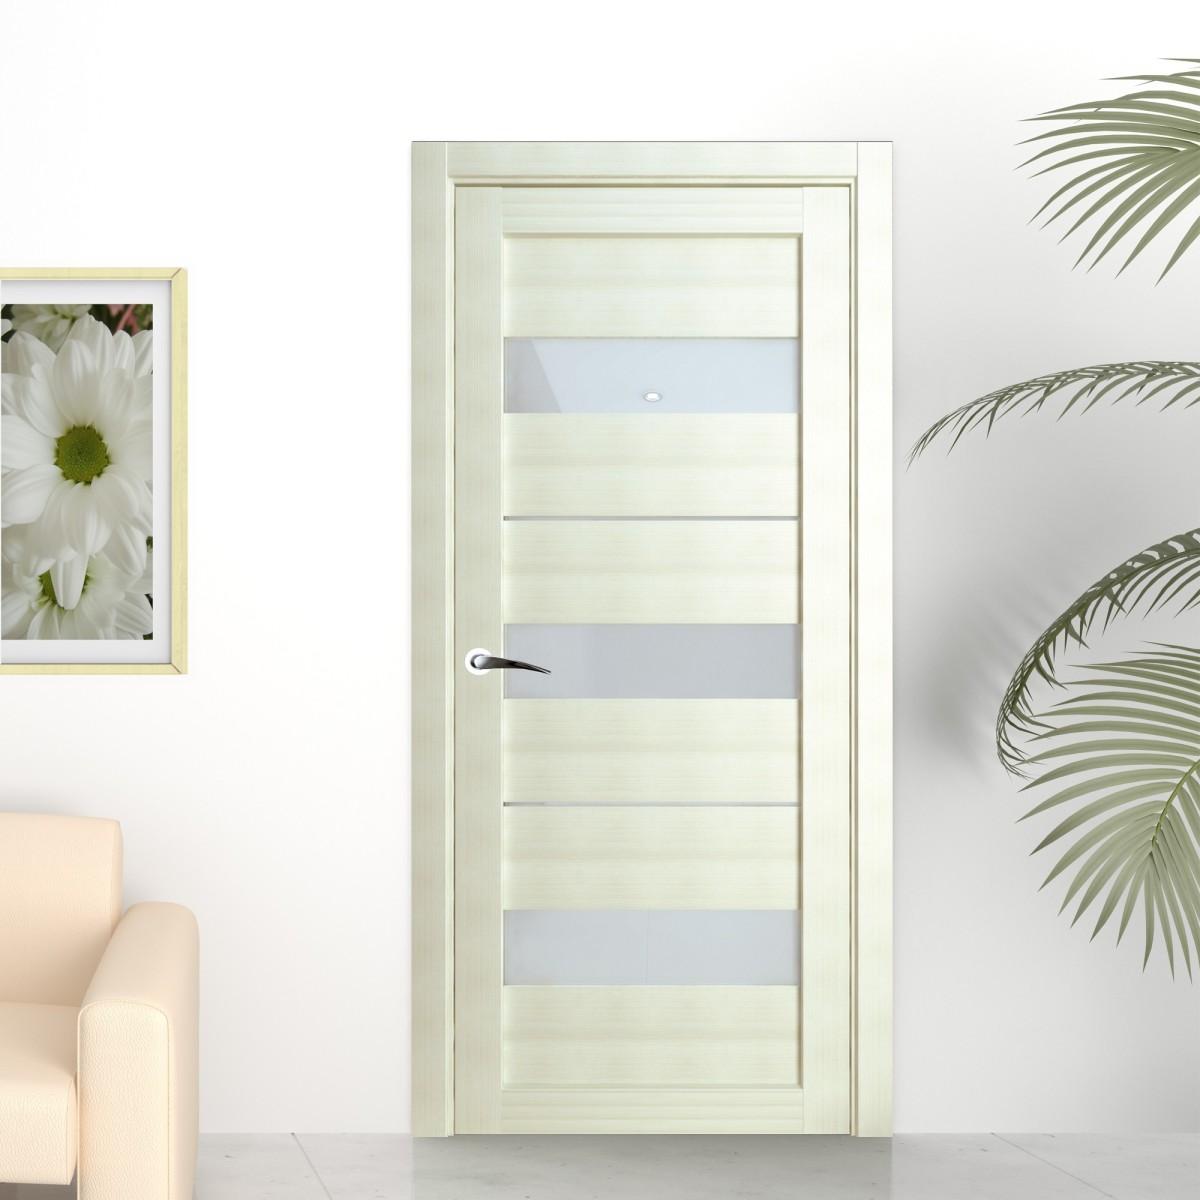 Дверь Межкомнатная Остеклённая «Сабрина» 200Х90 Ламинация Цвет Латте С Фурнитурой